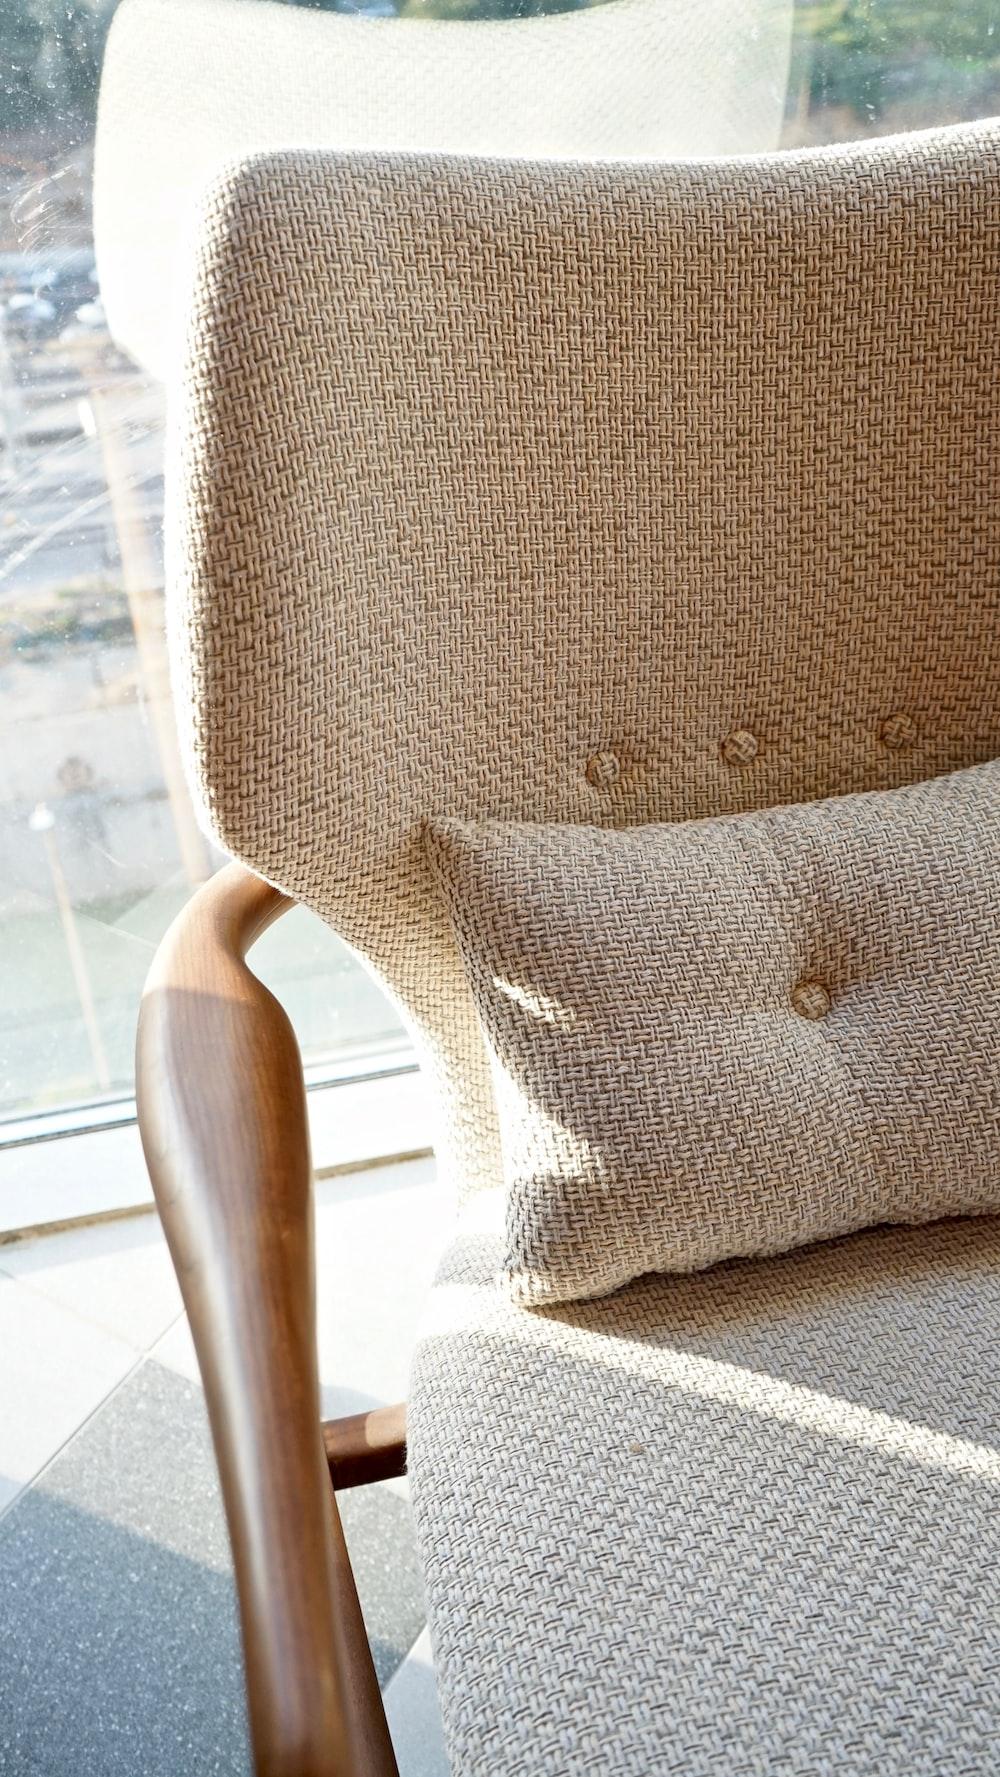 gray throw pillow on white wooden chair